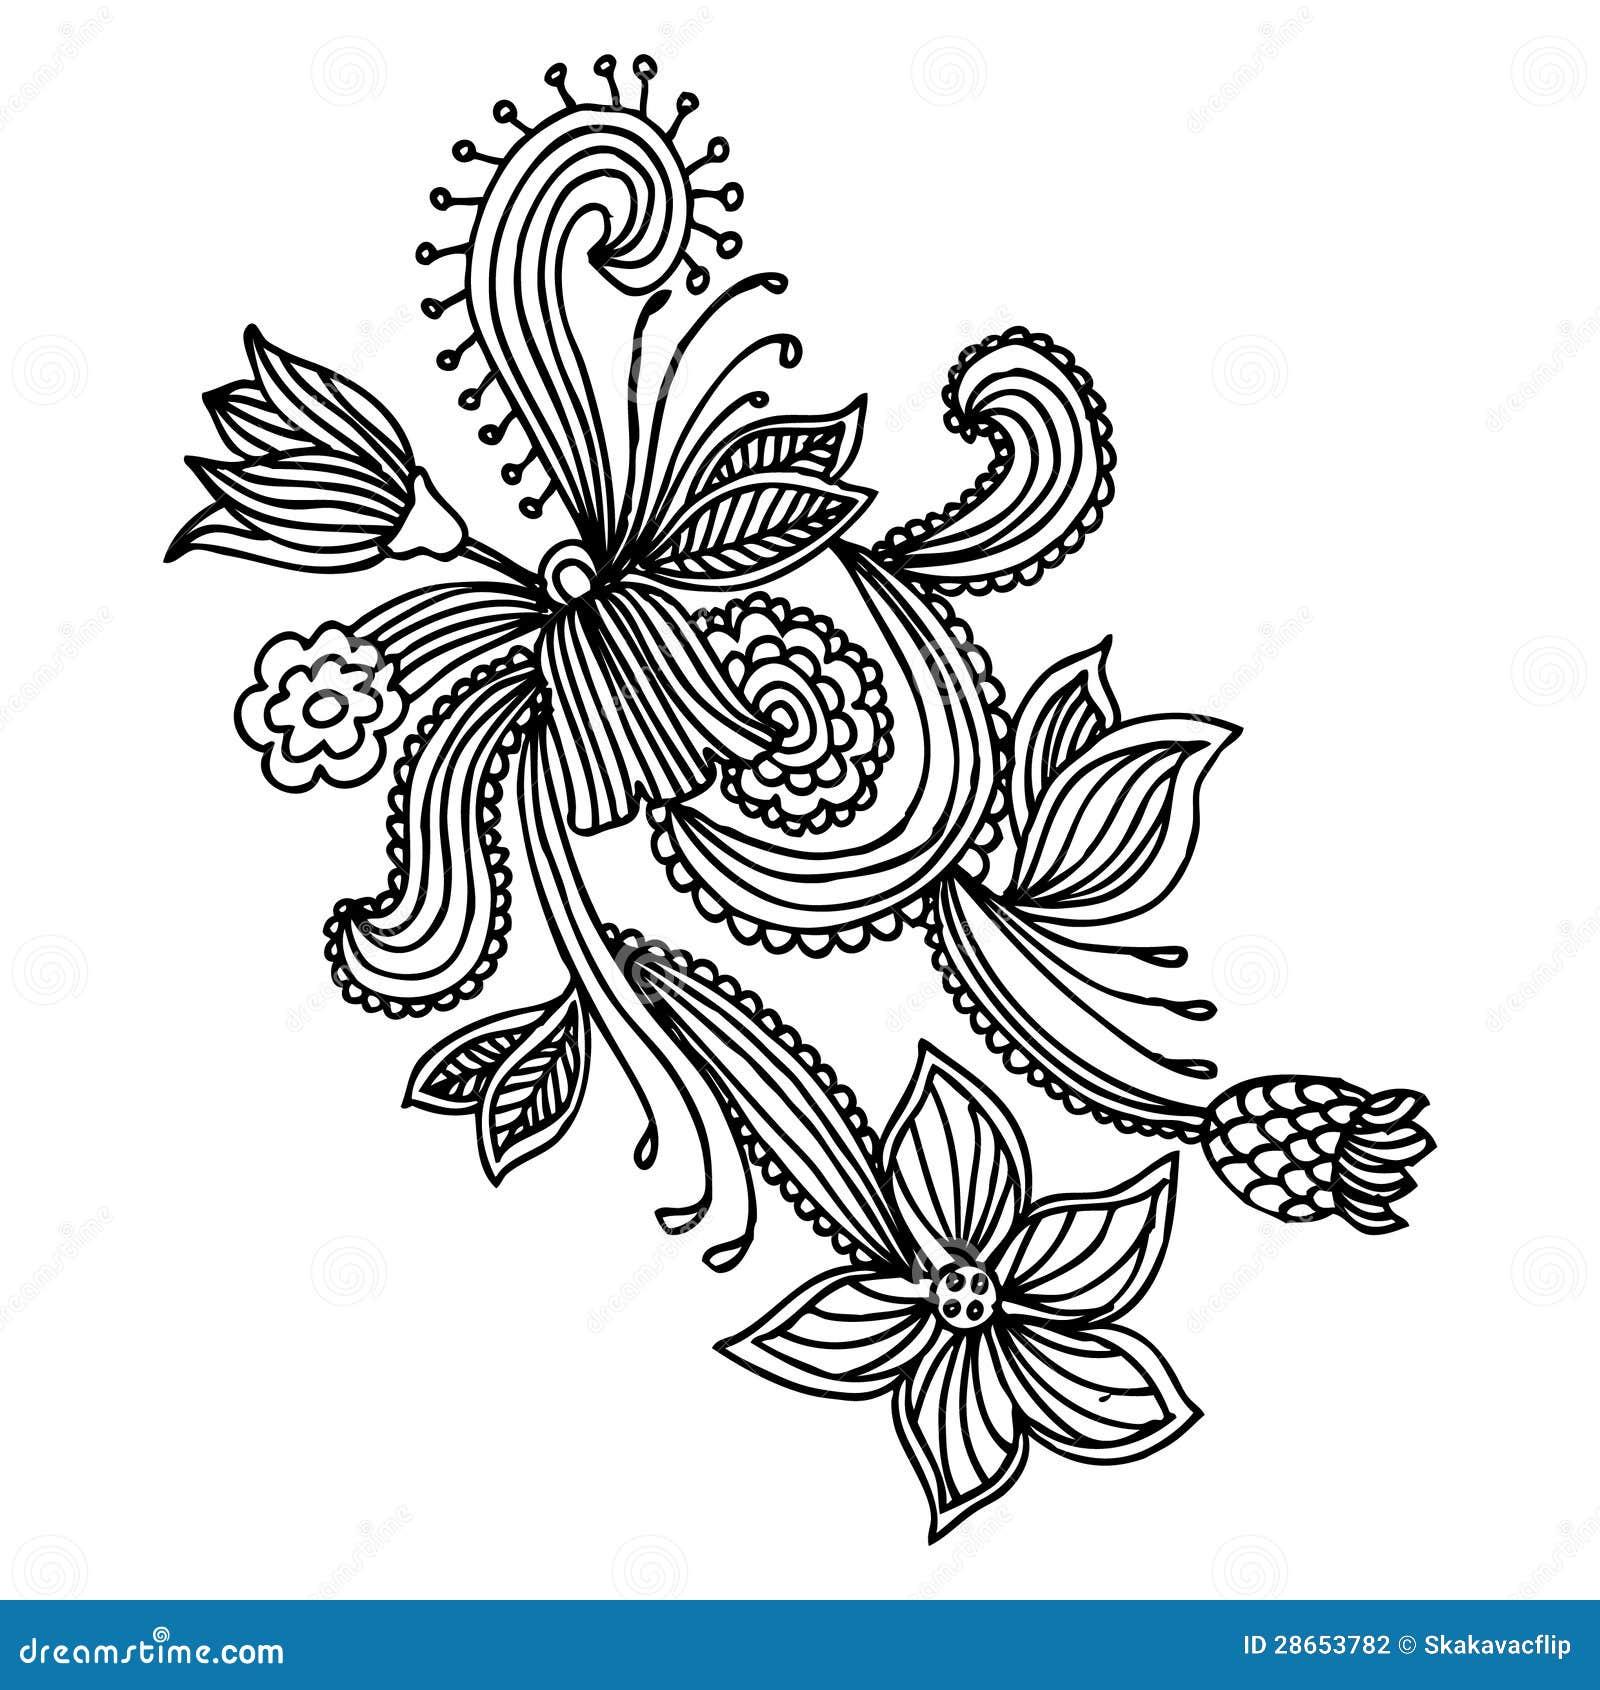 Pretty flower designs to draw on paper vatozozdevelopment pretty mightylinksfo